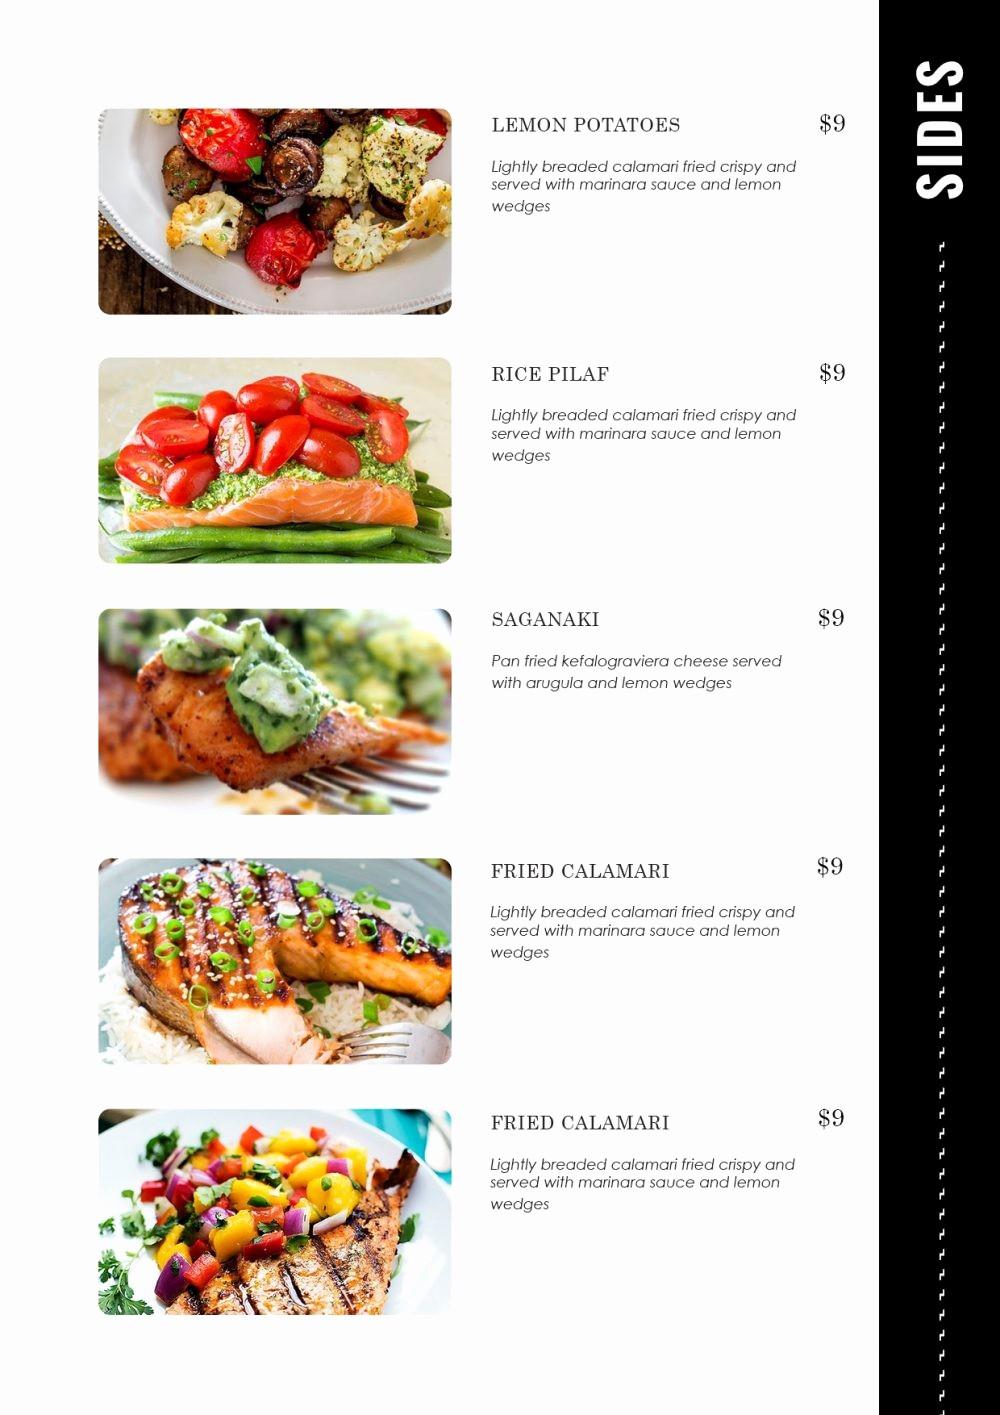 Restaurant Menu Template Microsoft Word Elegant Design & Templates Menu Templates Wedding Menu Food